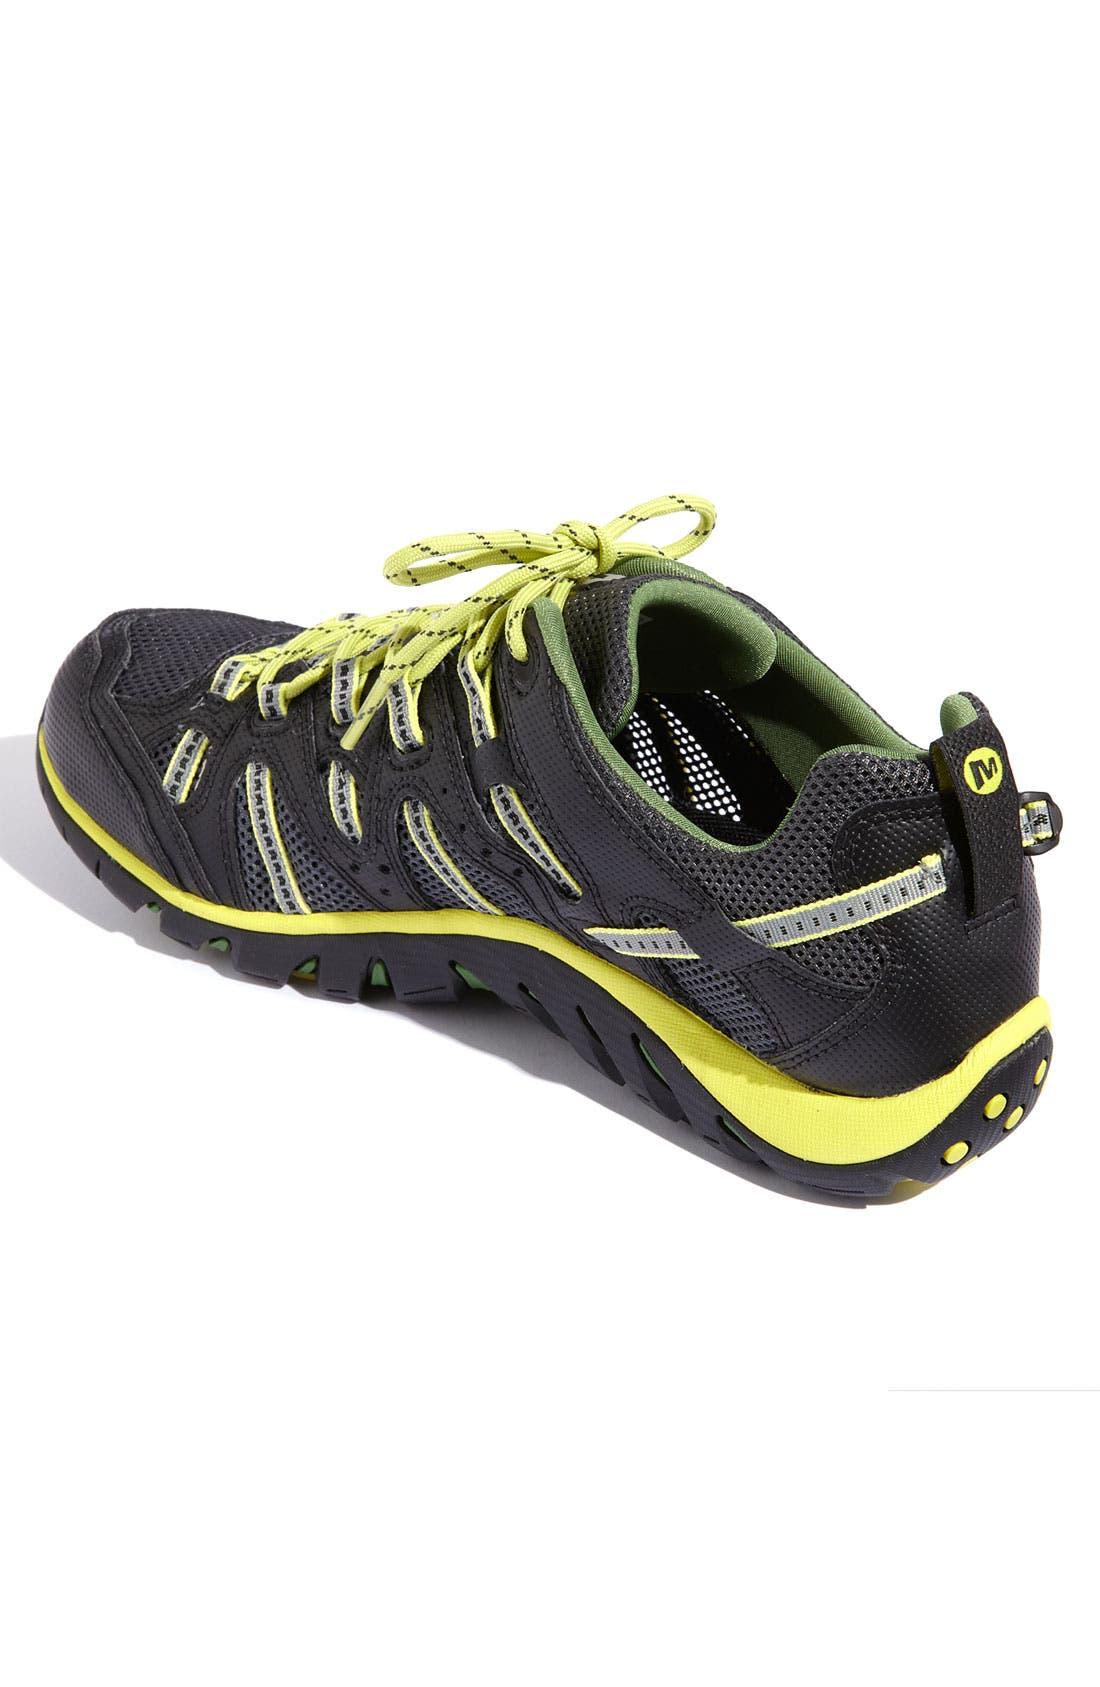 Alternate Image 2  - Merrell 'Waterpro Manistee' Trail Shoe (Men)